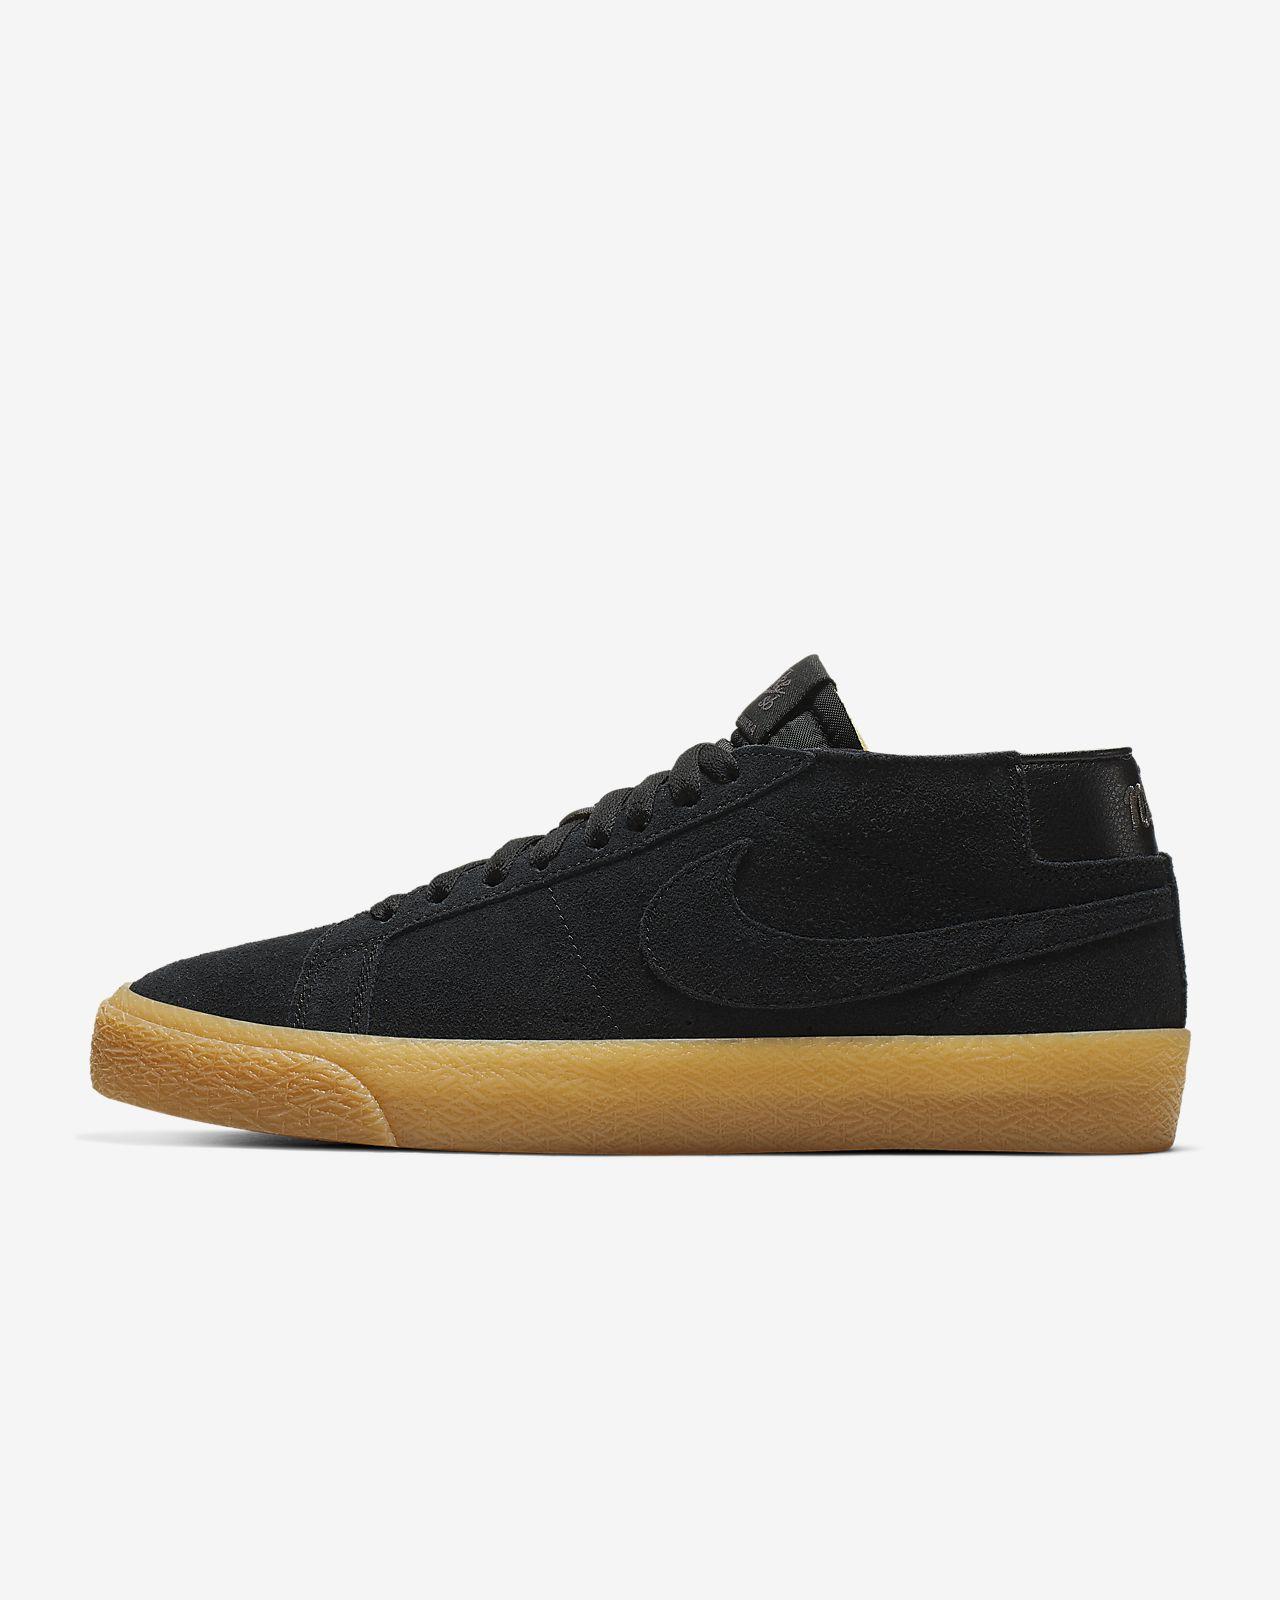 Skateboardsko Nike SB Zoom Blazer Chukka för män